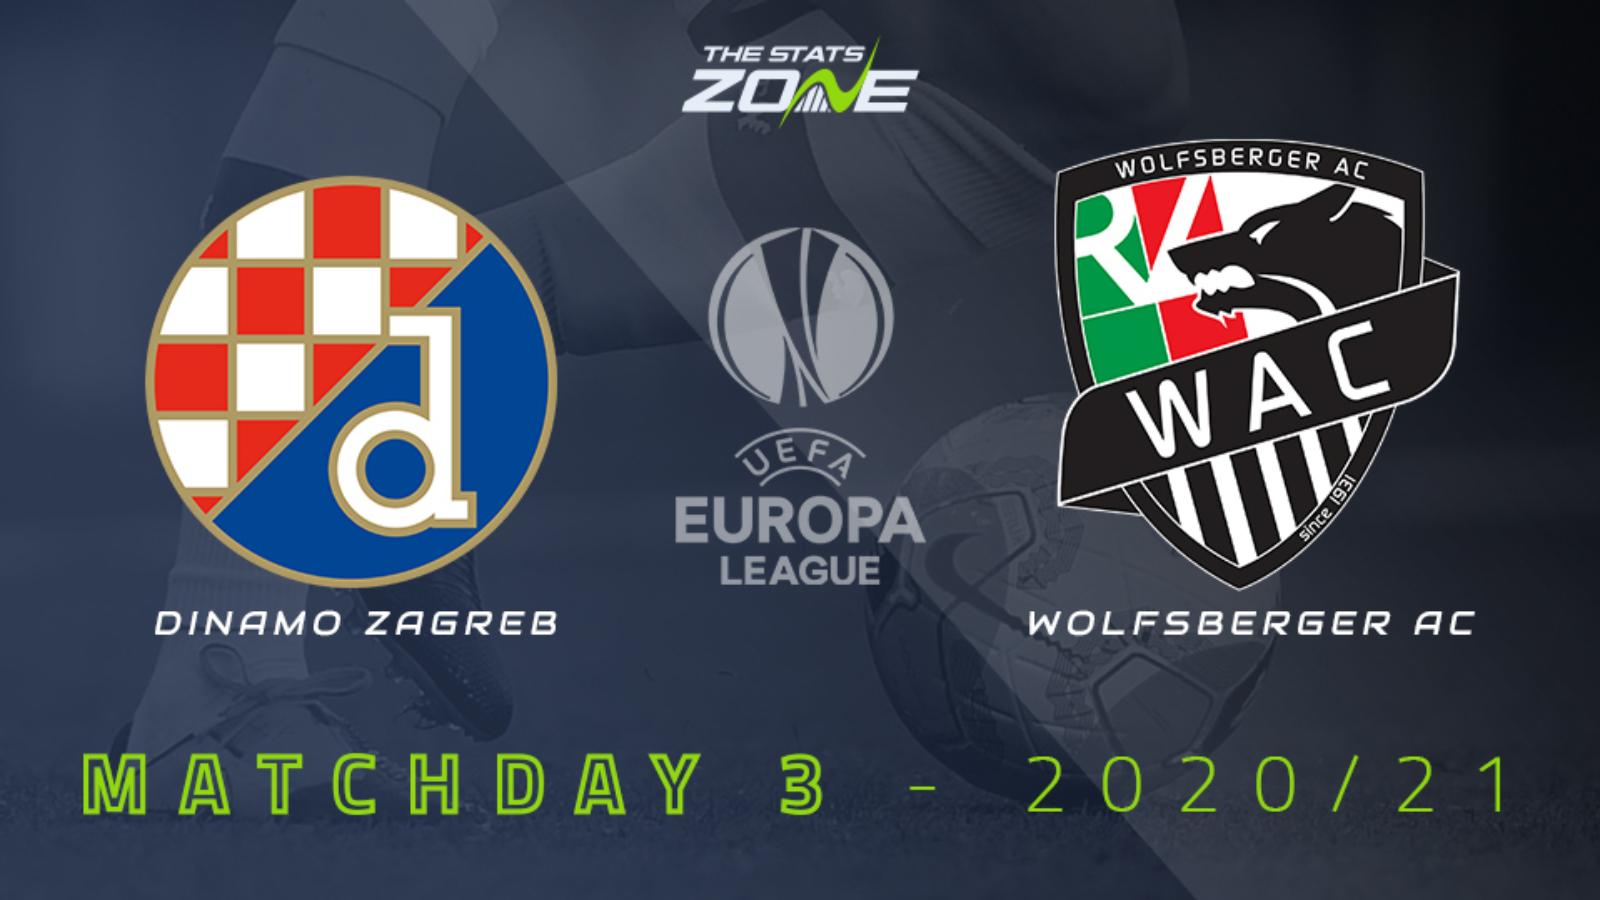 2020 21 Uefa Europa League Dinamo Zagreb Vs Wolfsberger Ac Preview Prediction The Stats Zone